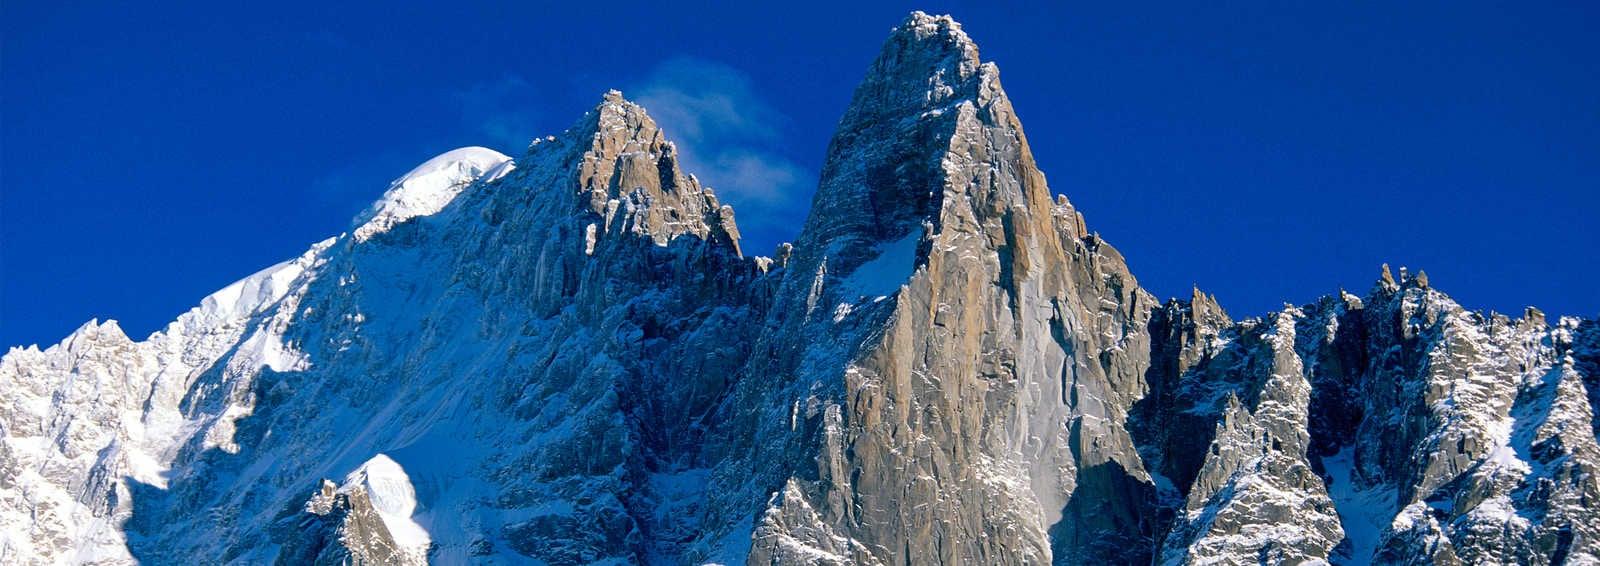 Aguille Verte and Le Drus above Chamonix